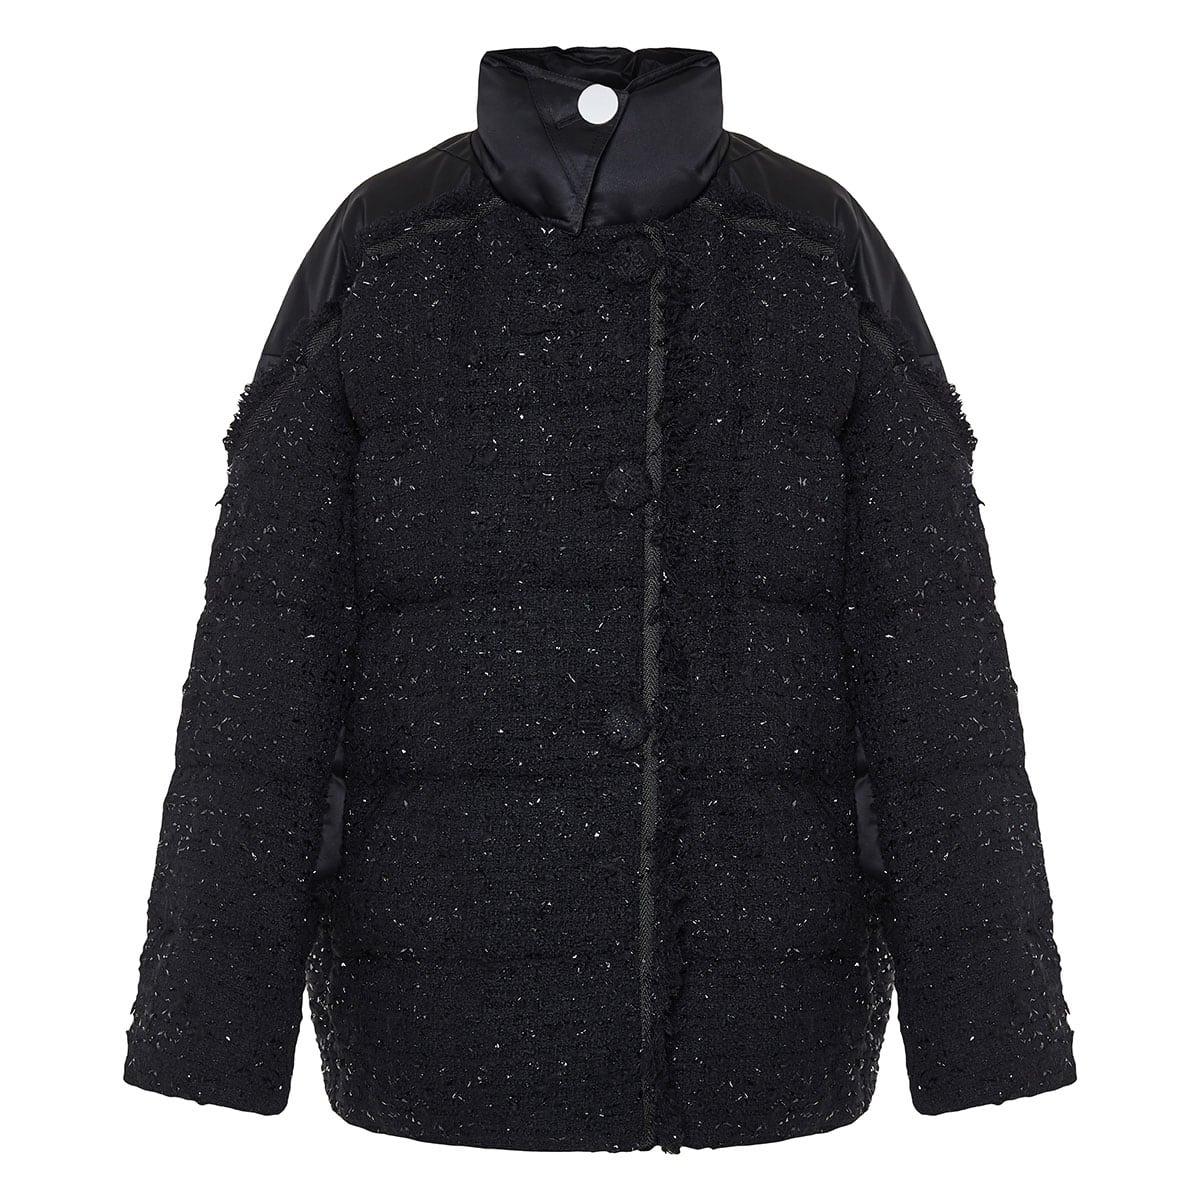 2 MONCLER 1952+VALEXTRA Guada tweed puffer jacket